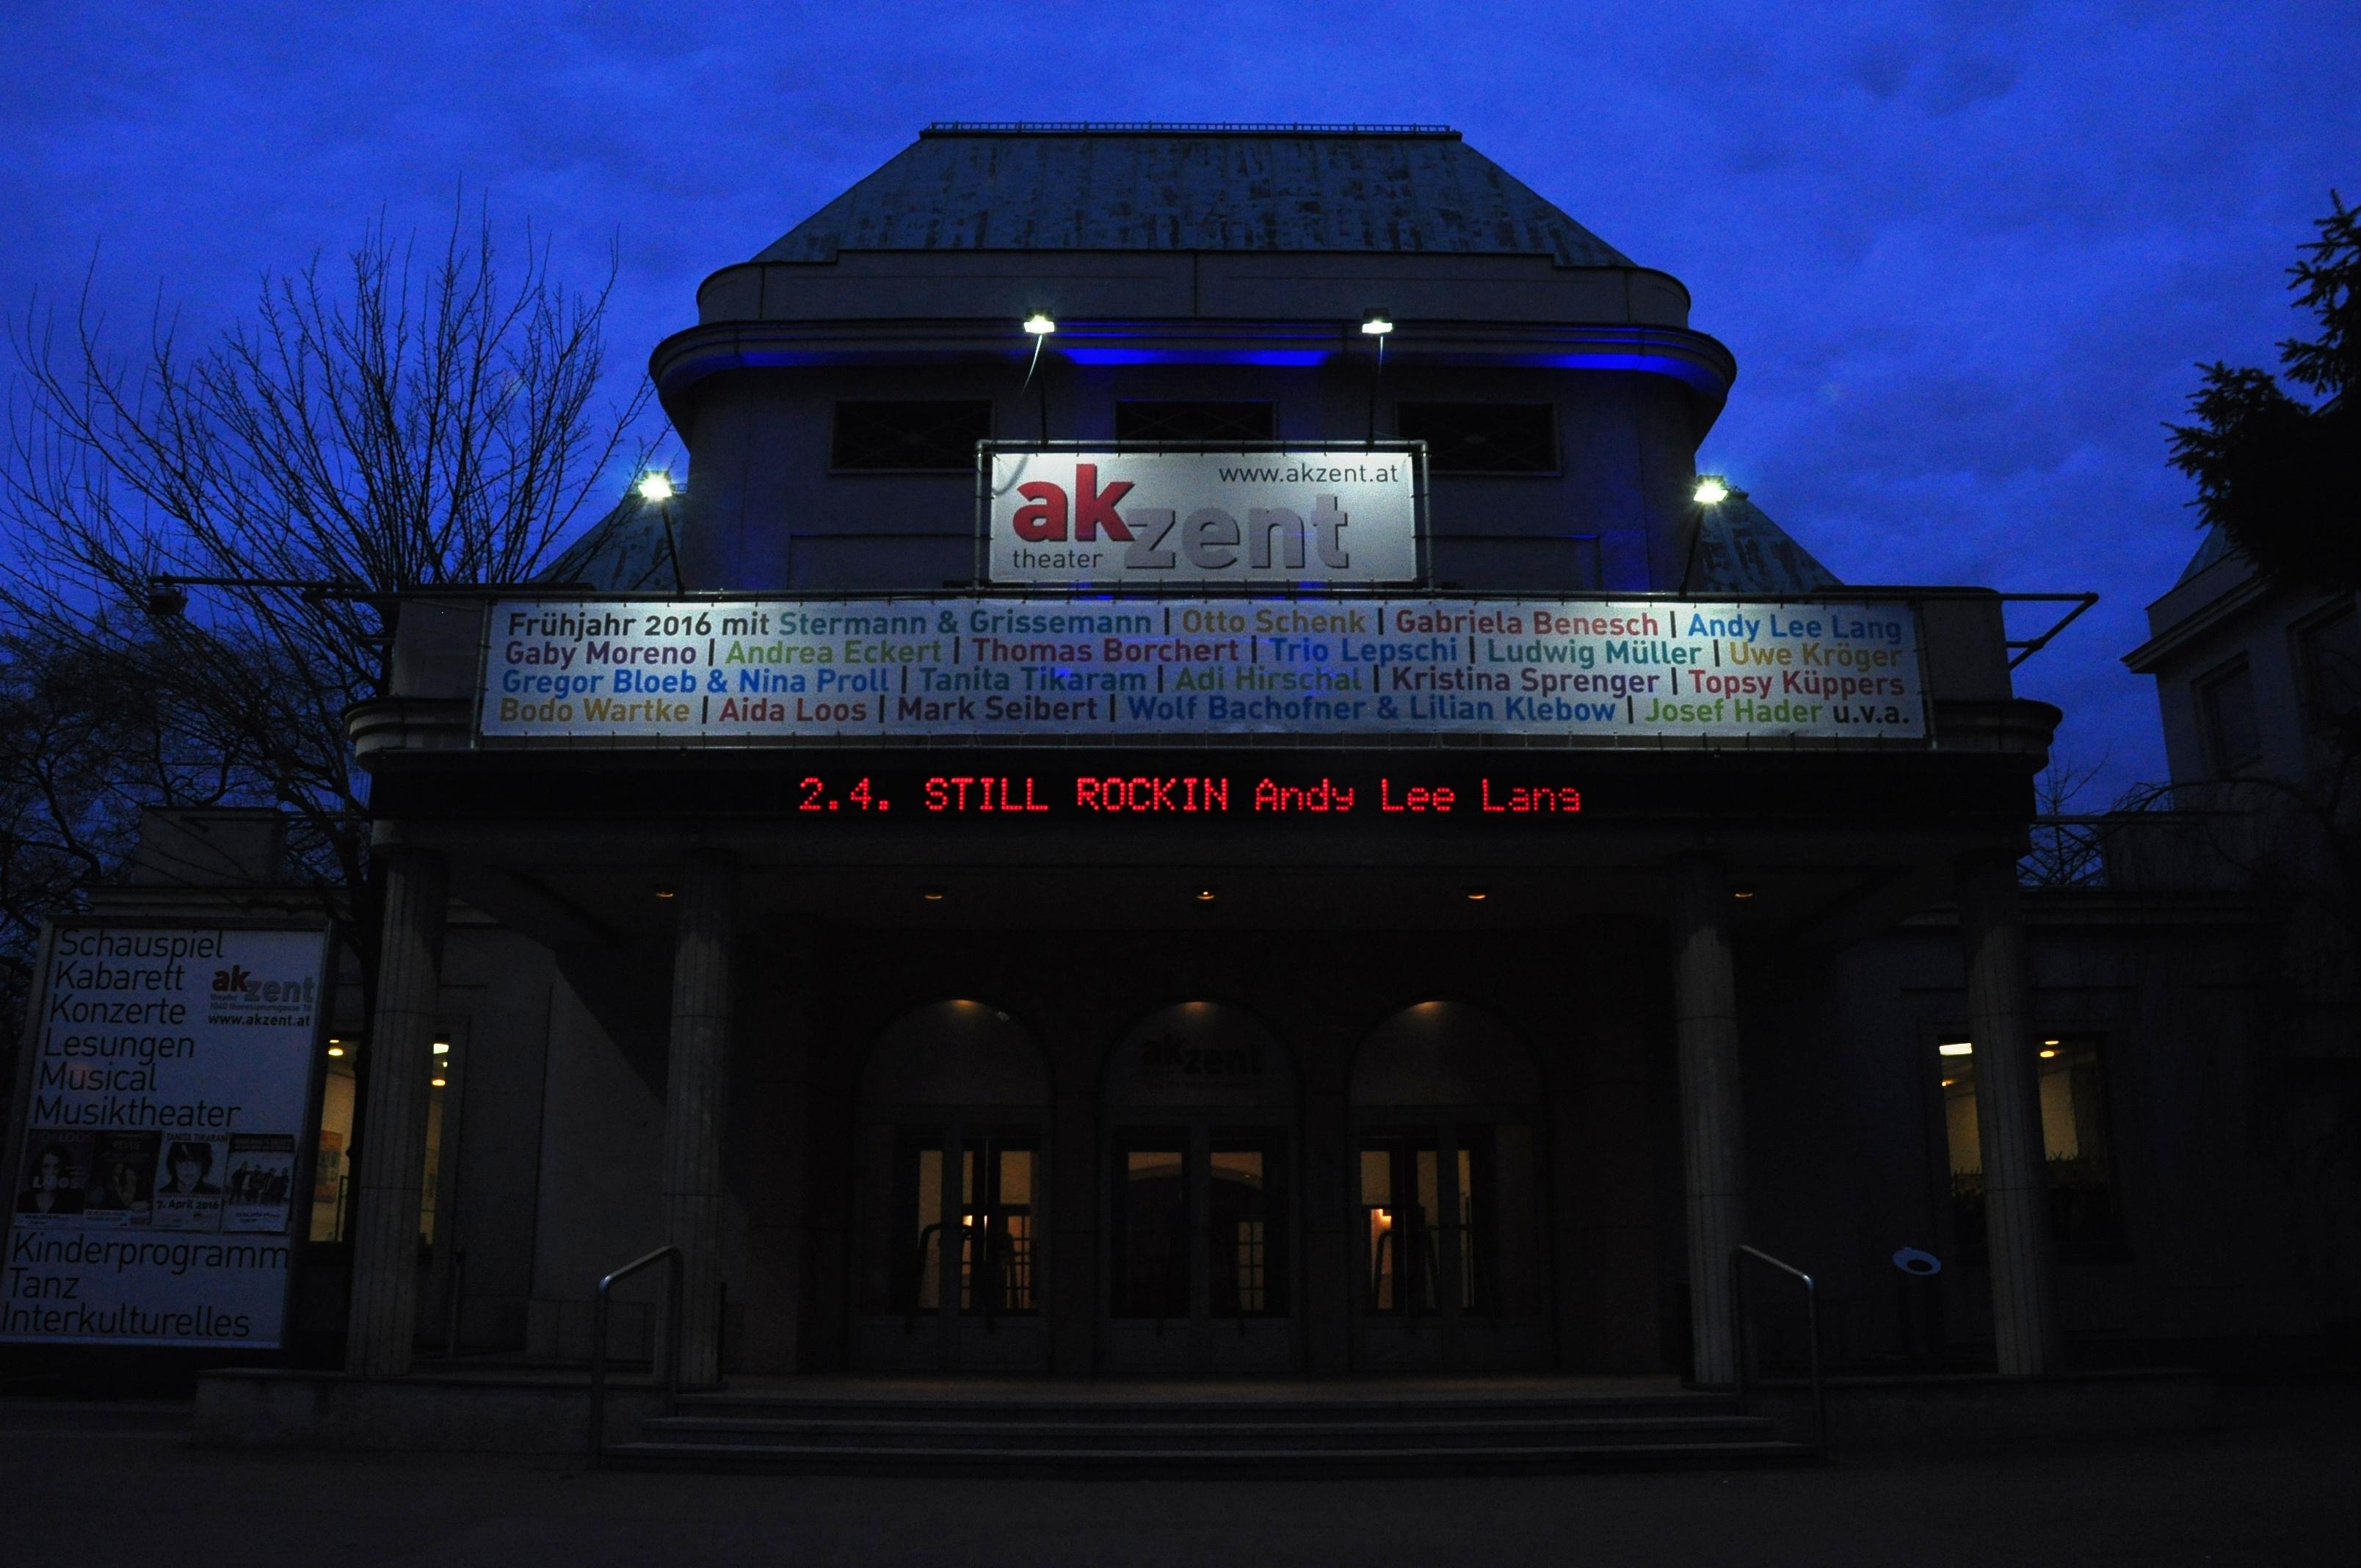 Das Theater Akzent in bleu.